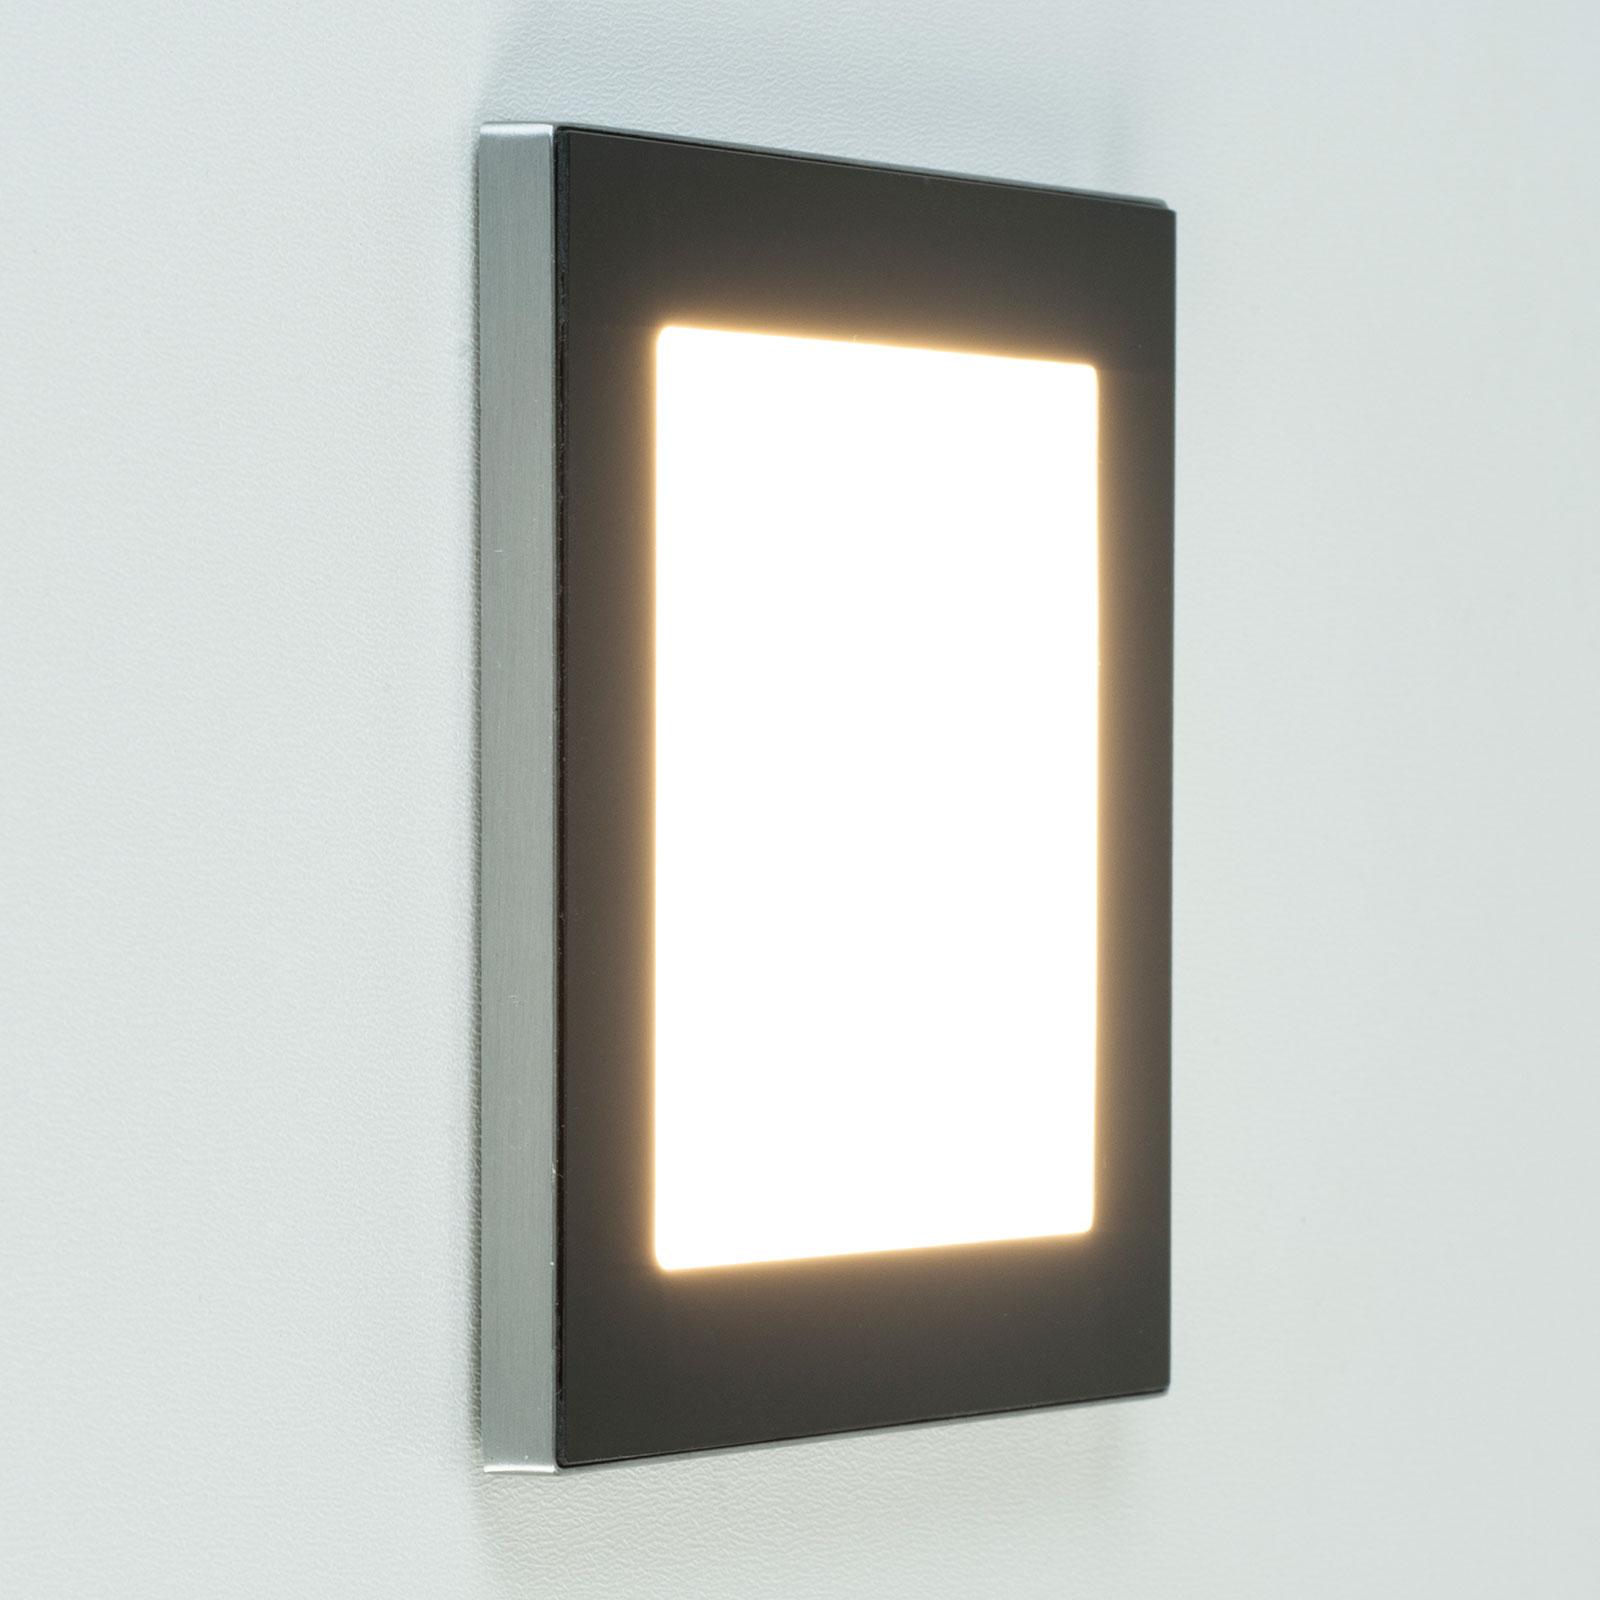 BRUMBERG 10035 LED-Wandeinbauleuchte schwarz